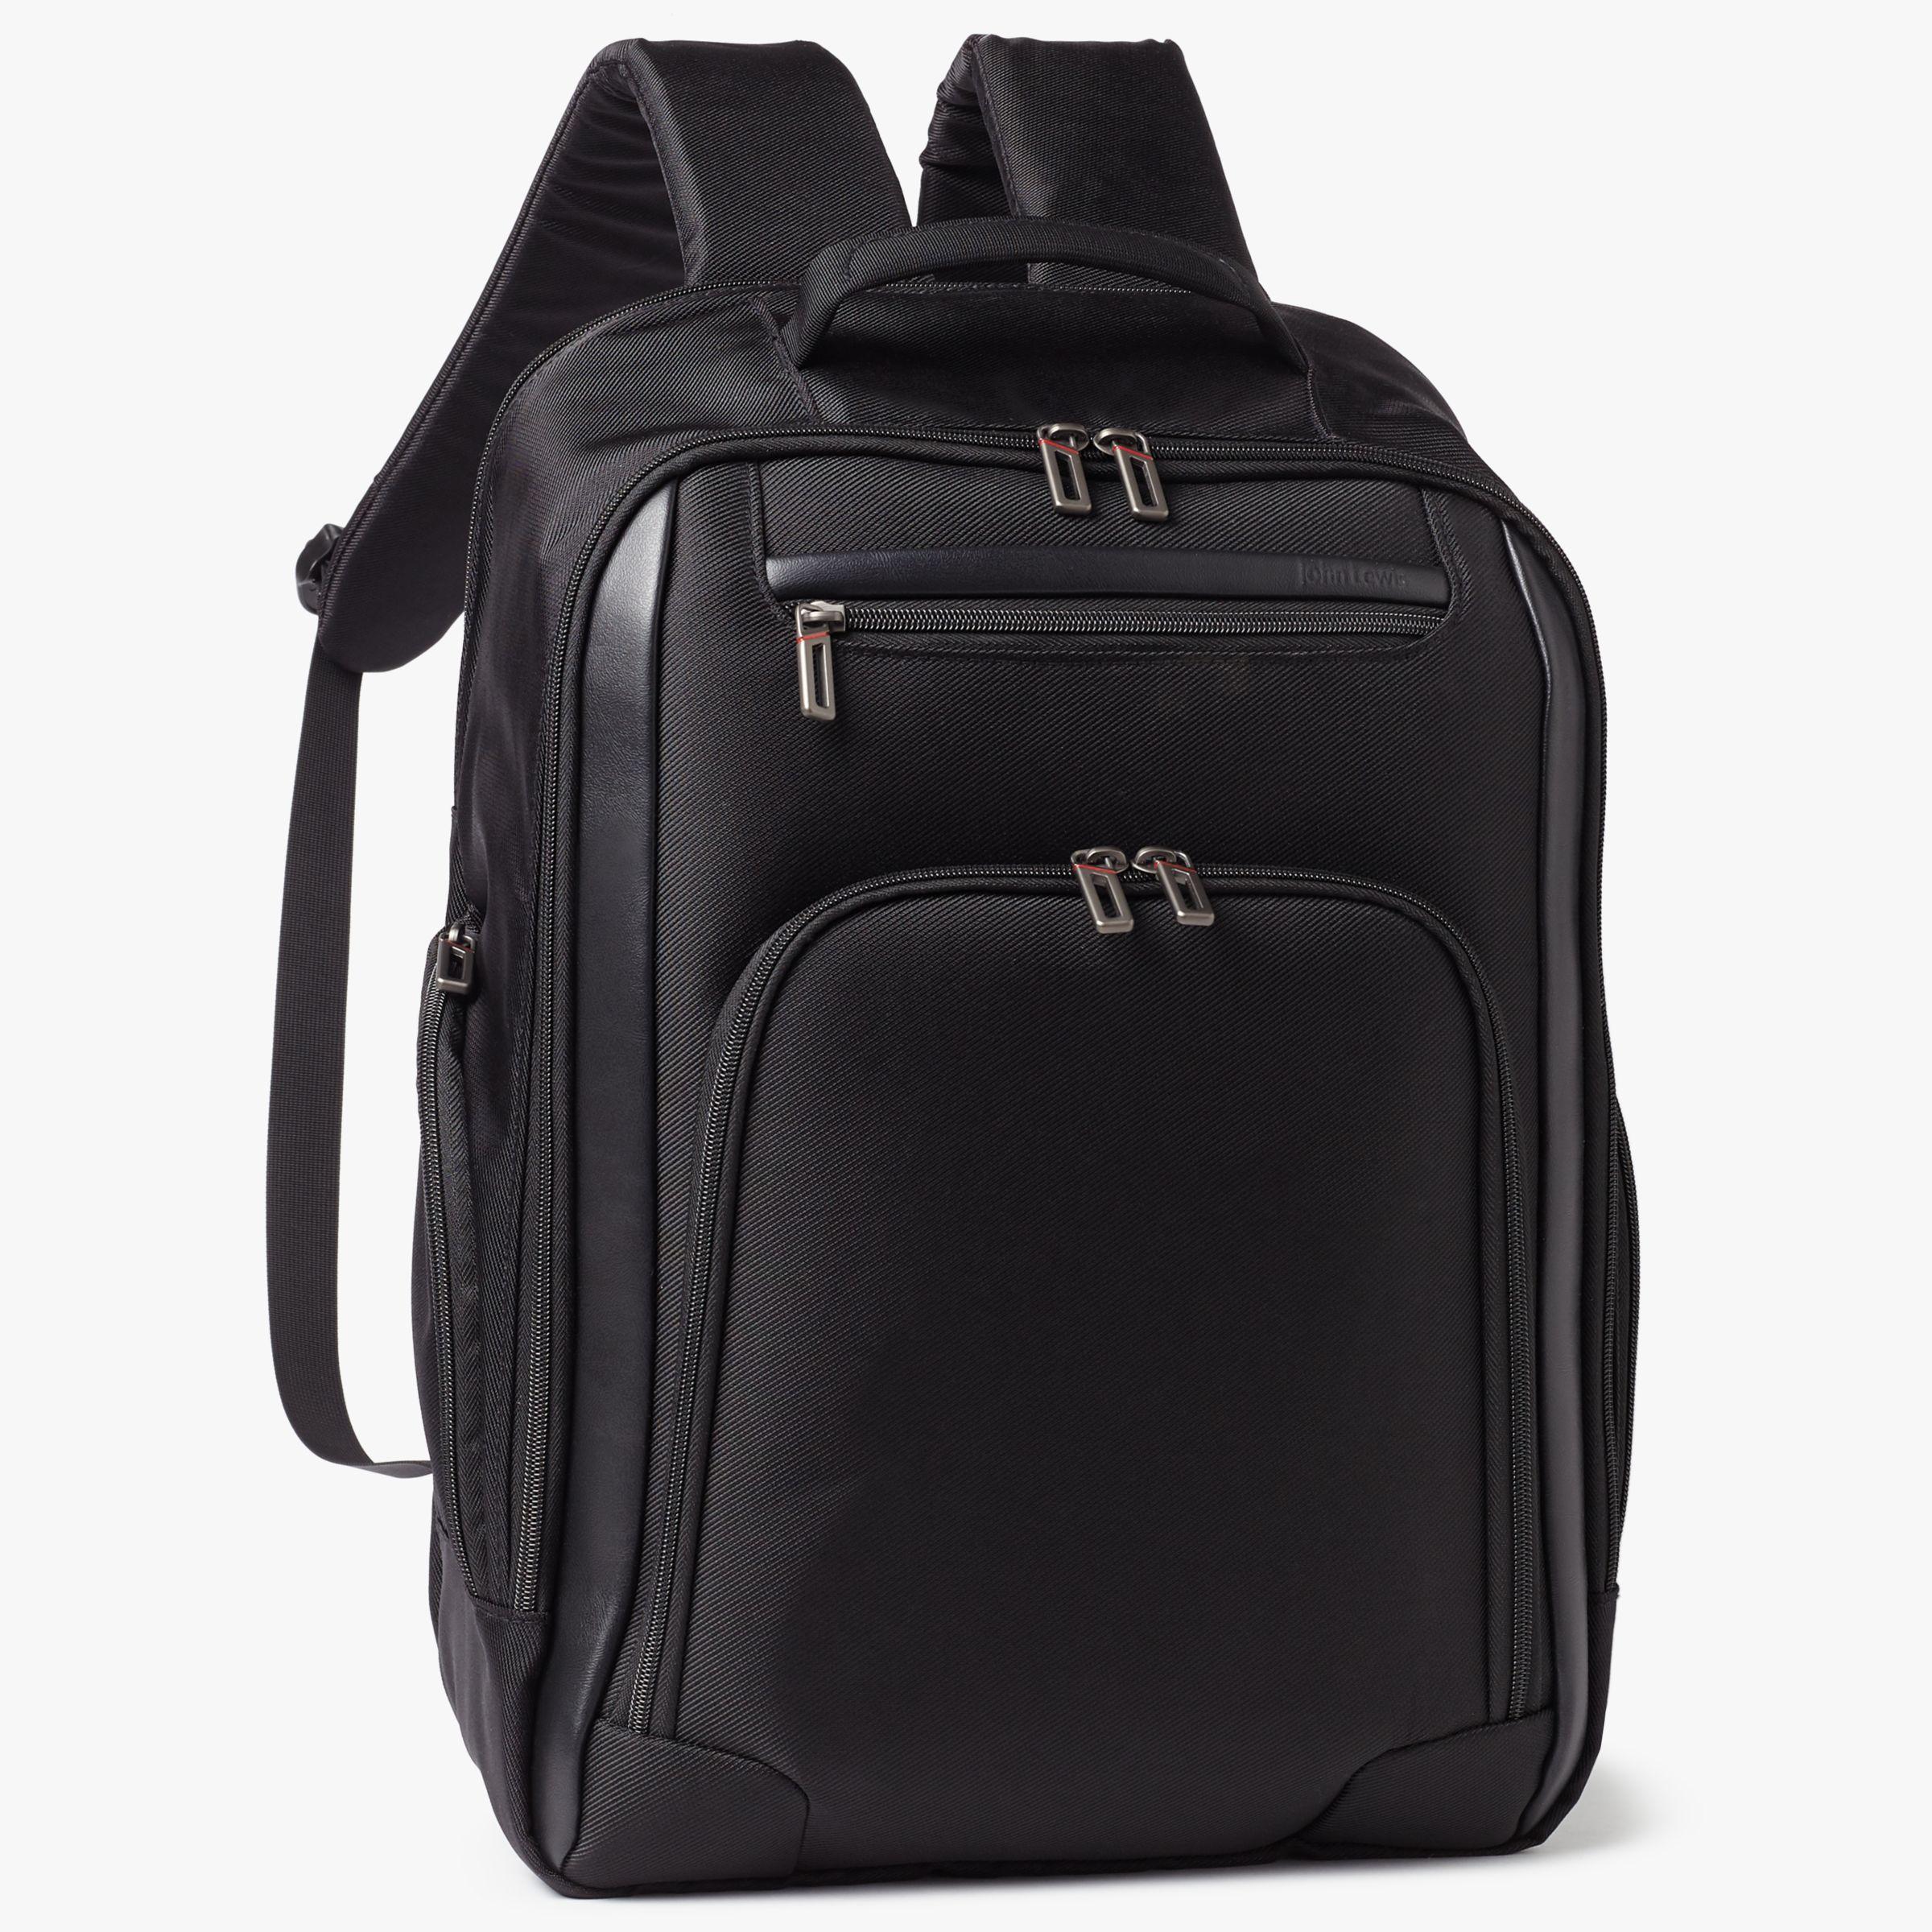 bcdfd97613f4 John Lewis & Partners Raise Expandable 17inch Laptop Backpack, Black